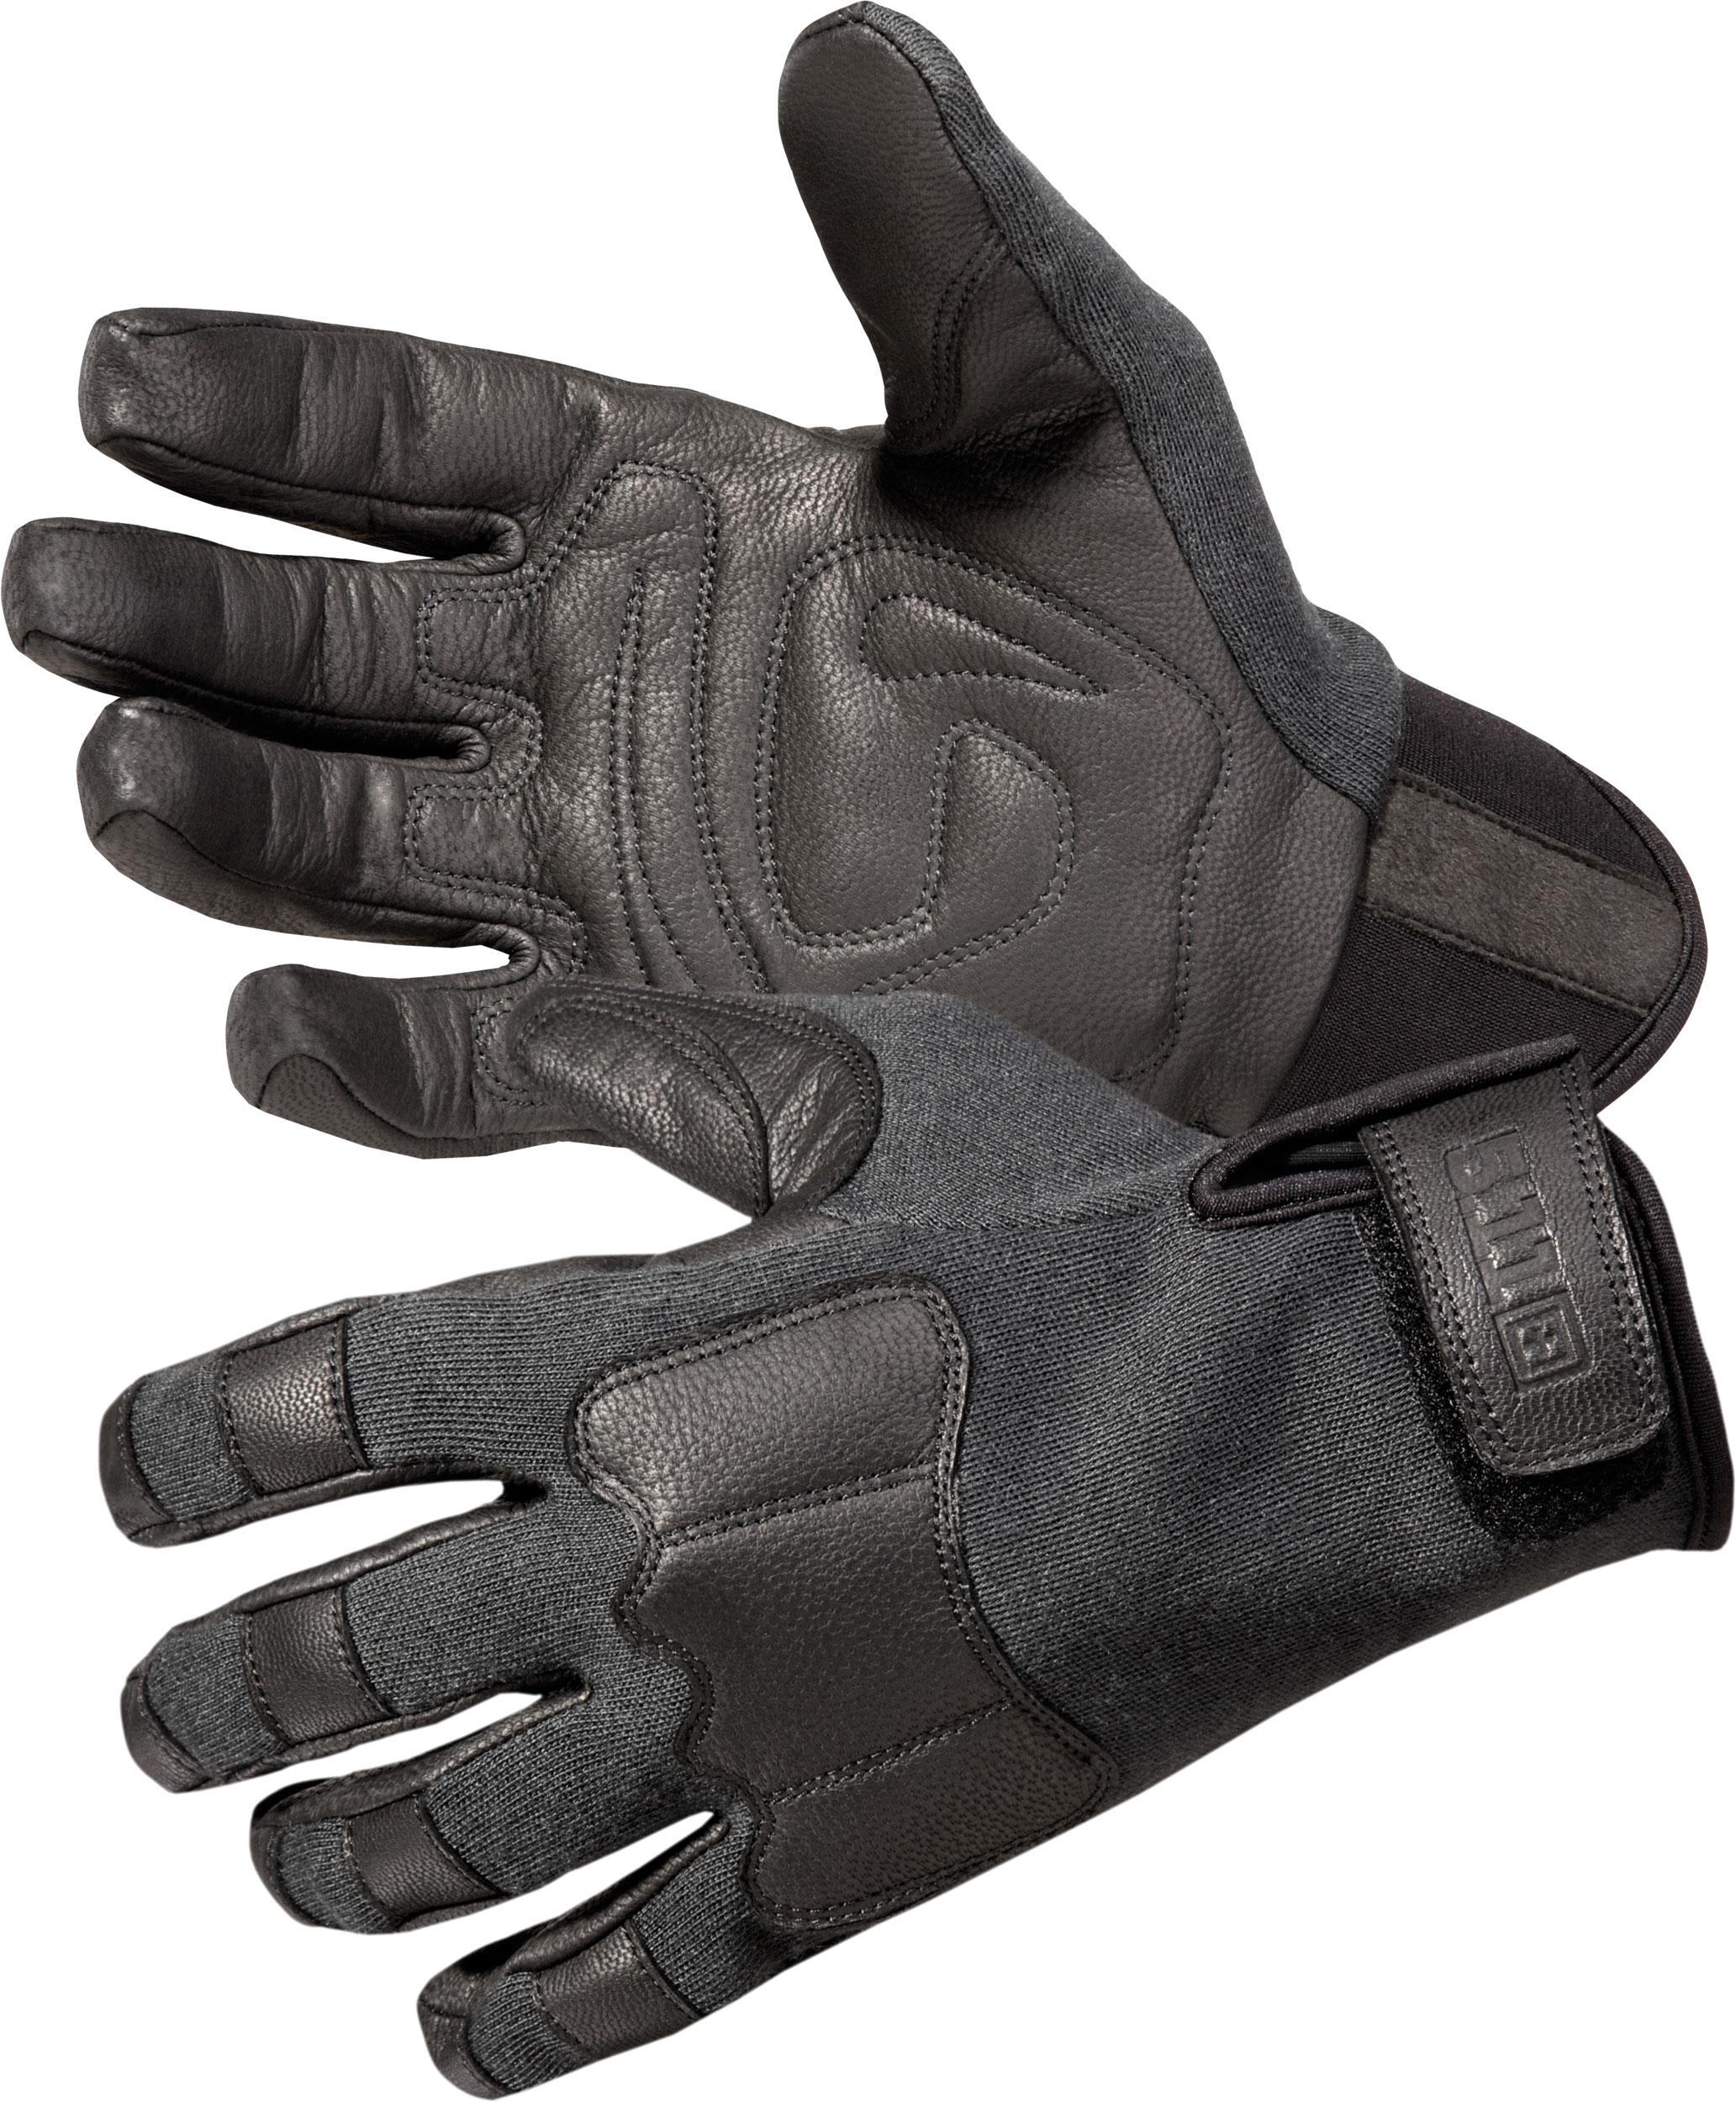 5.11 Tactical TAC AK2 Gloves, Black, X Large (59341)